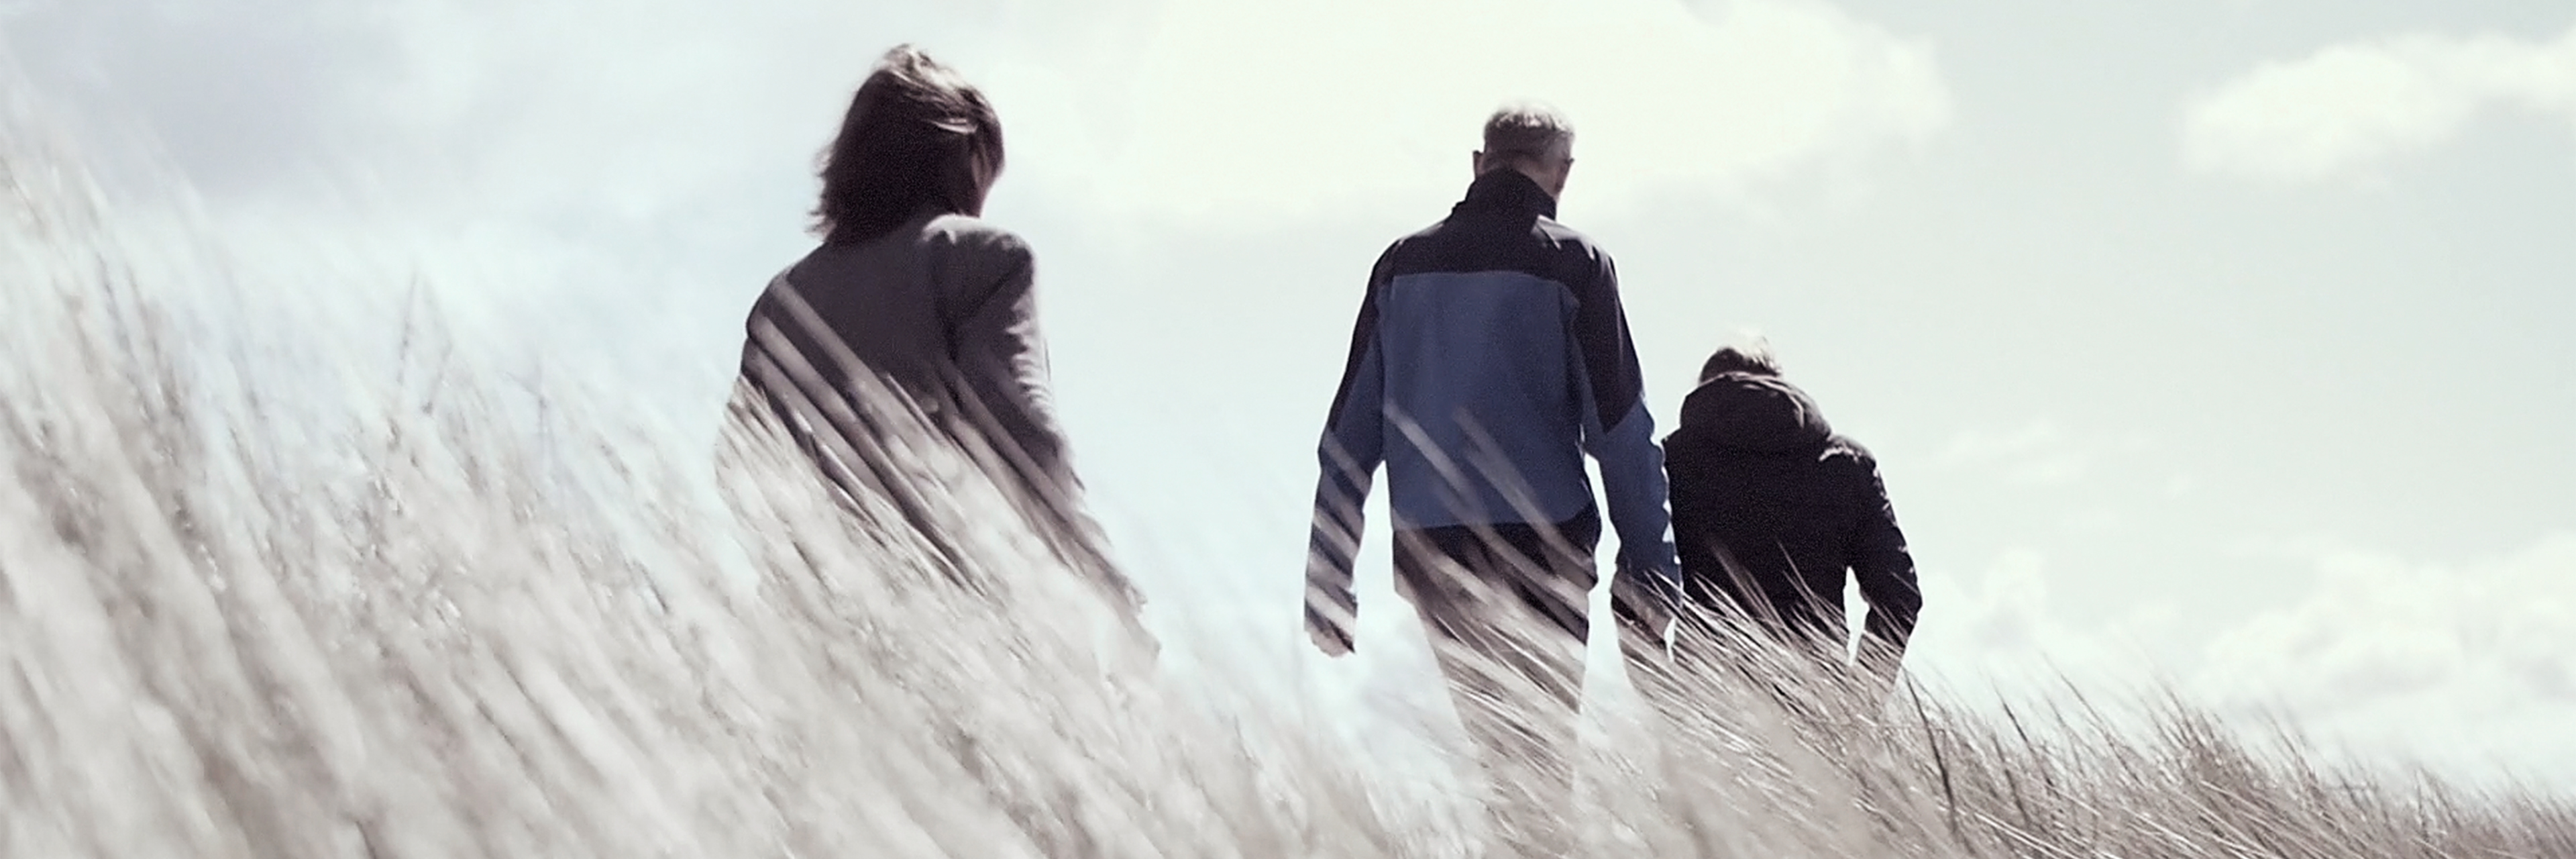 Jan-Paul Bron, Jean-Paul Janse en Renee Bron-Slis in de duinen